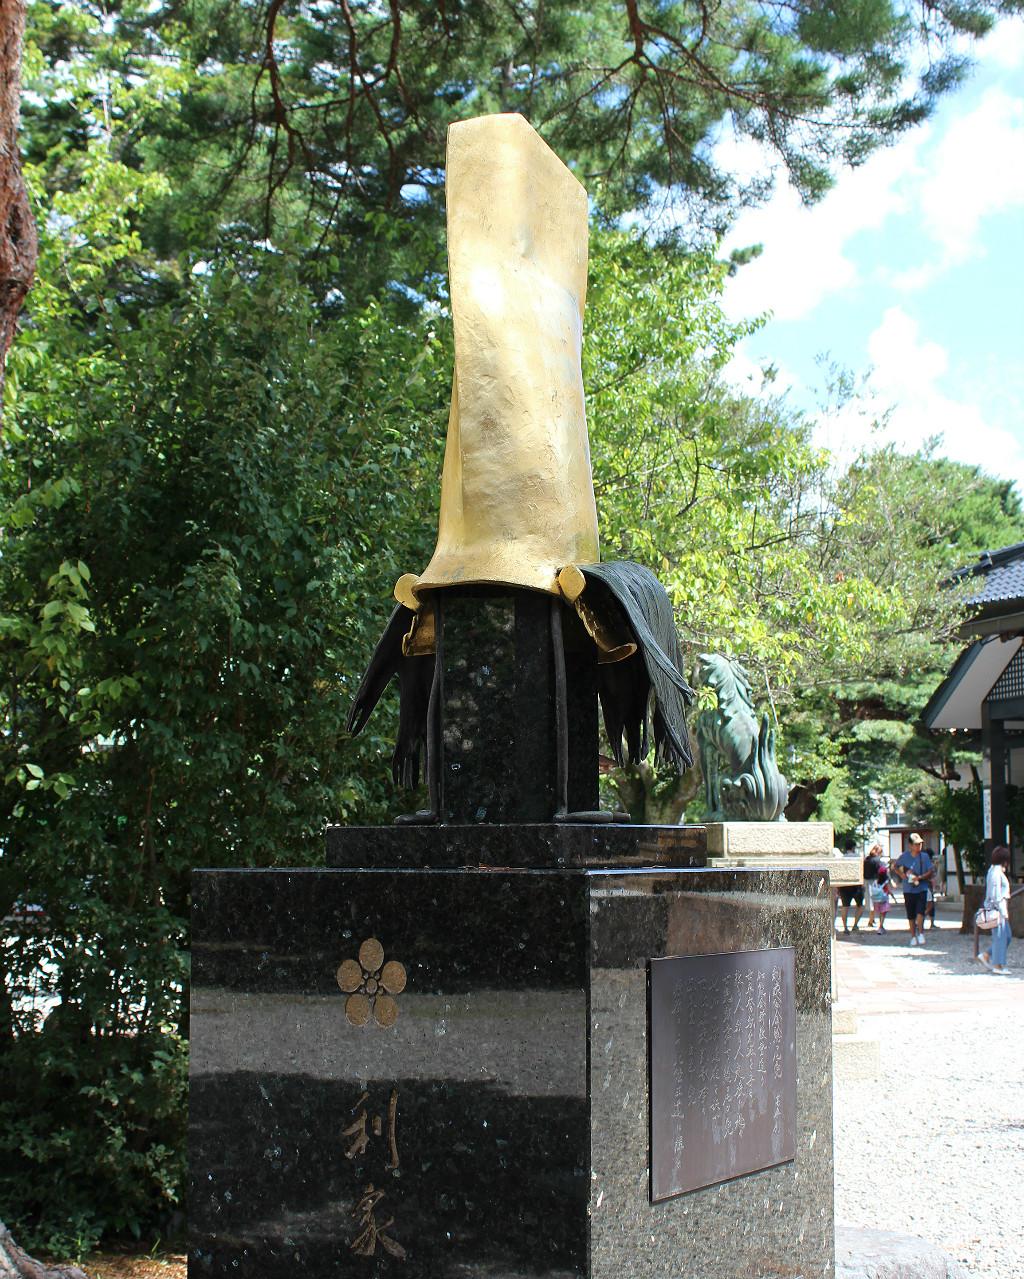 The catfish tail ornamental headdress of Toshiie Maeda at Oyama Shrine in Kanazawa, Japan